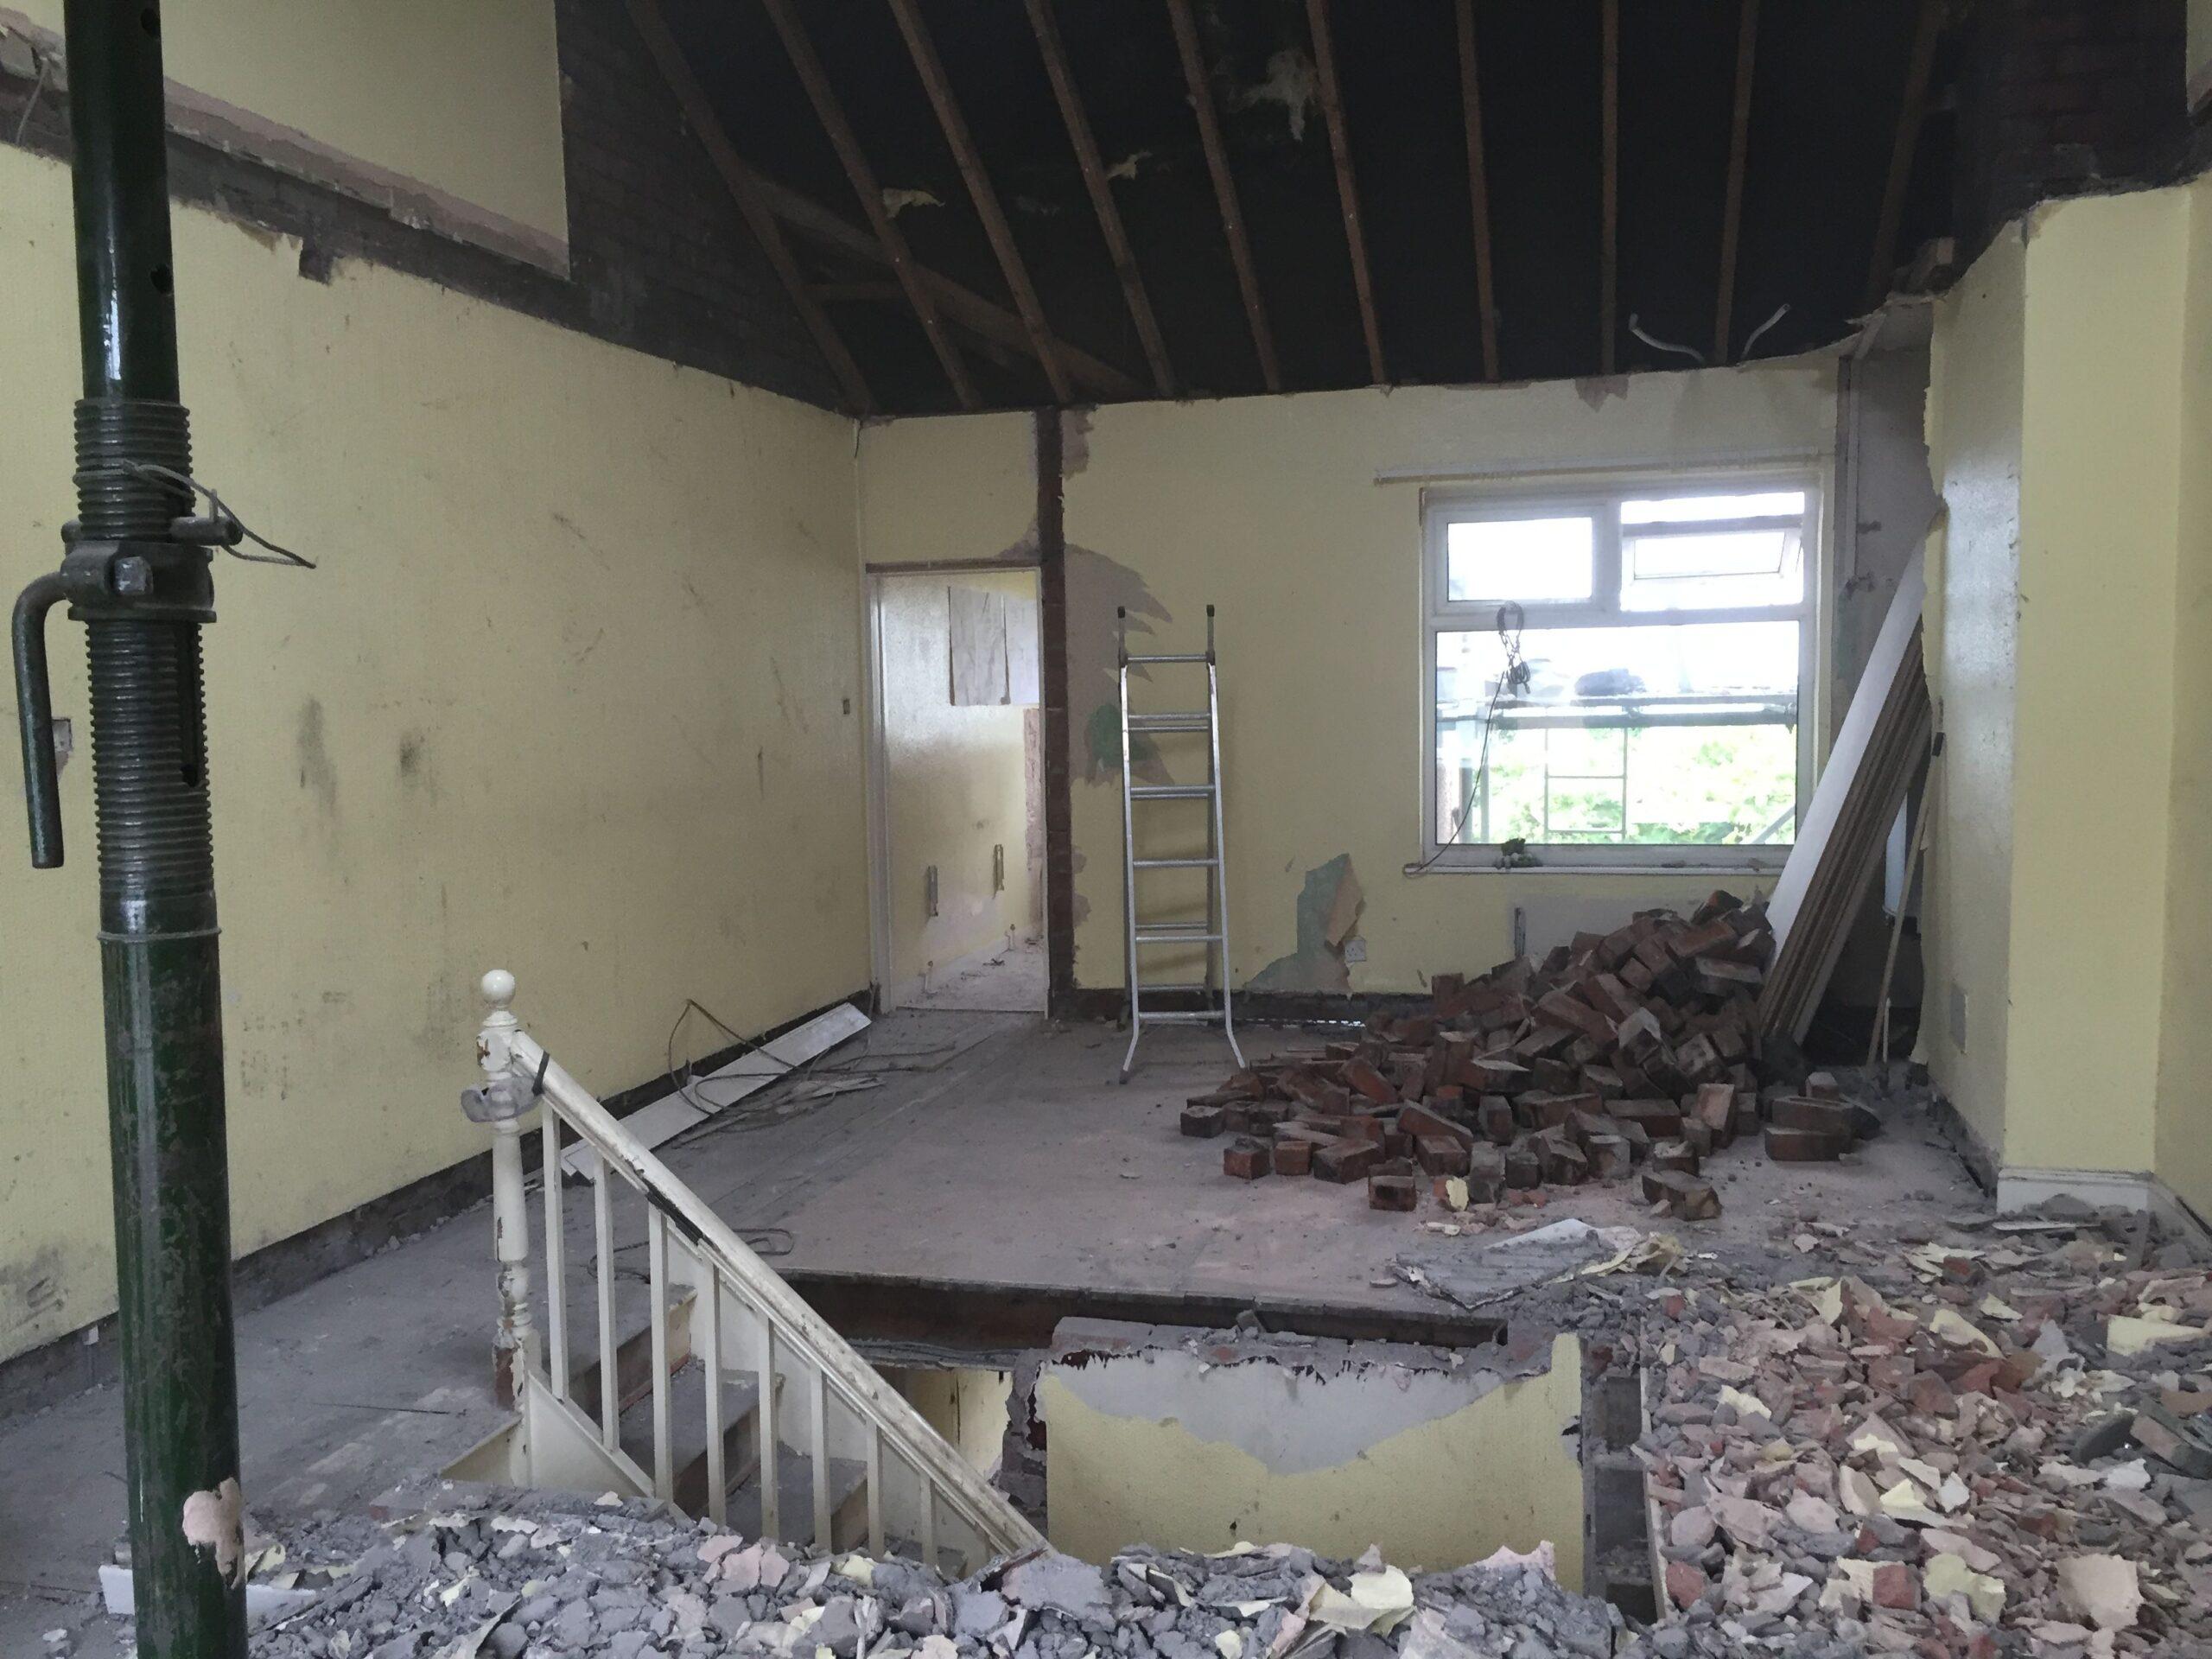 Dunkerry Road First Floor Landing Demolition Before 2